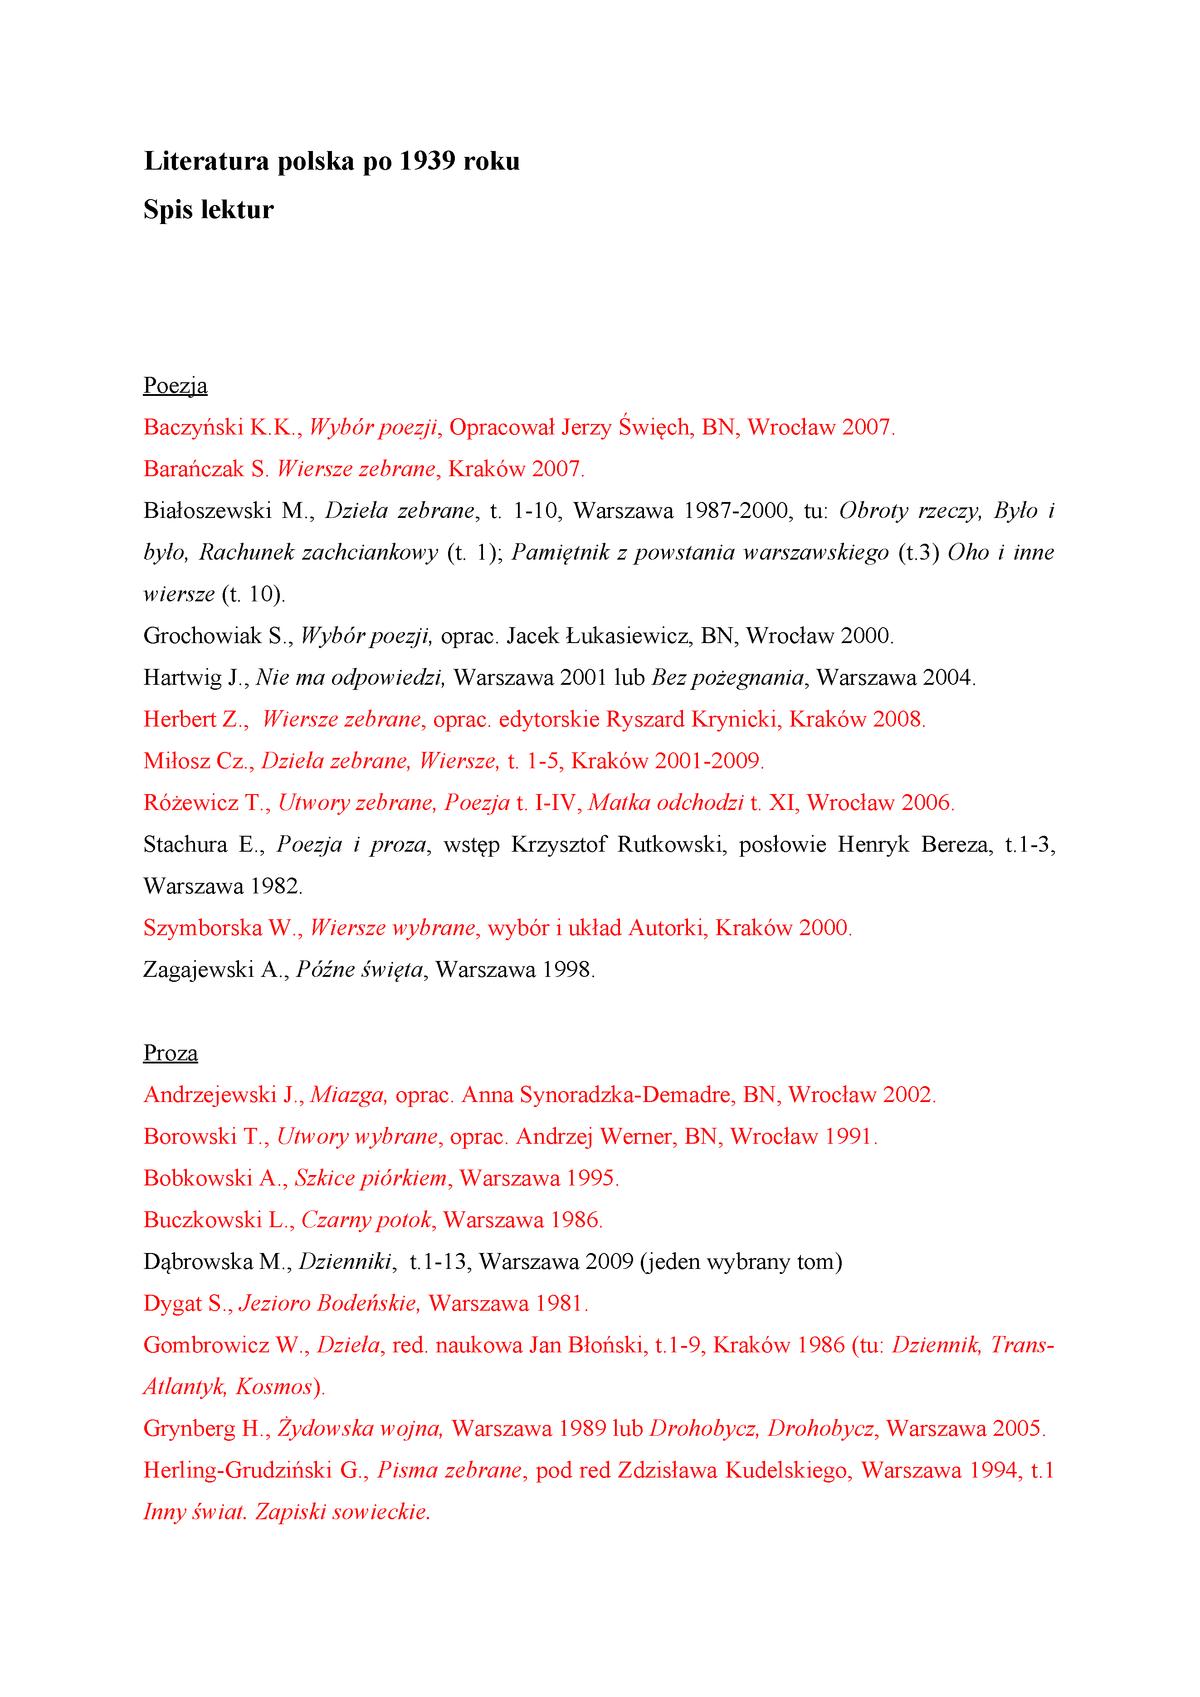 Lit Po 39 Filologia Polska Filologia Polska Studocu